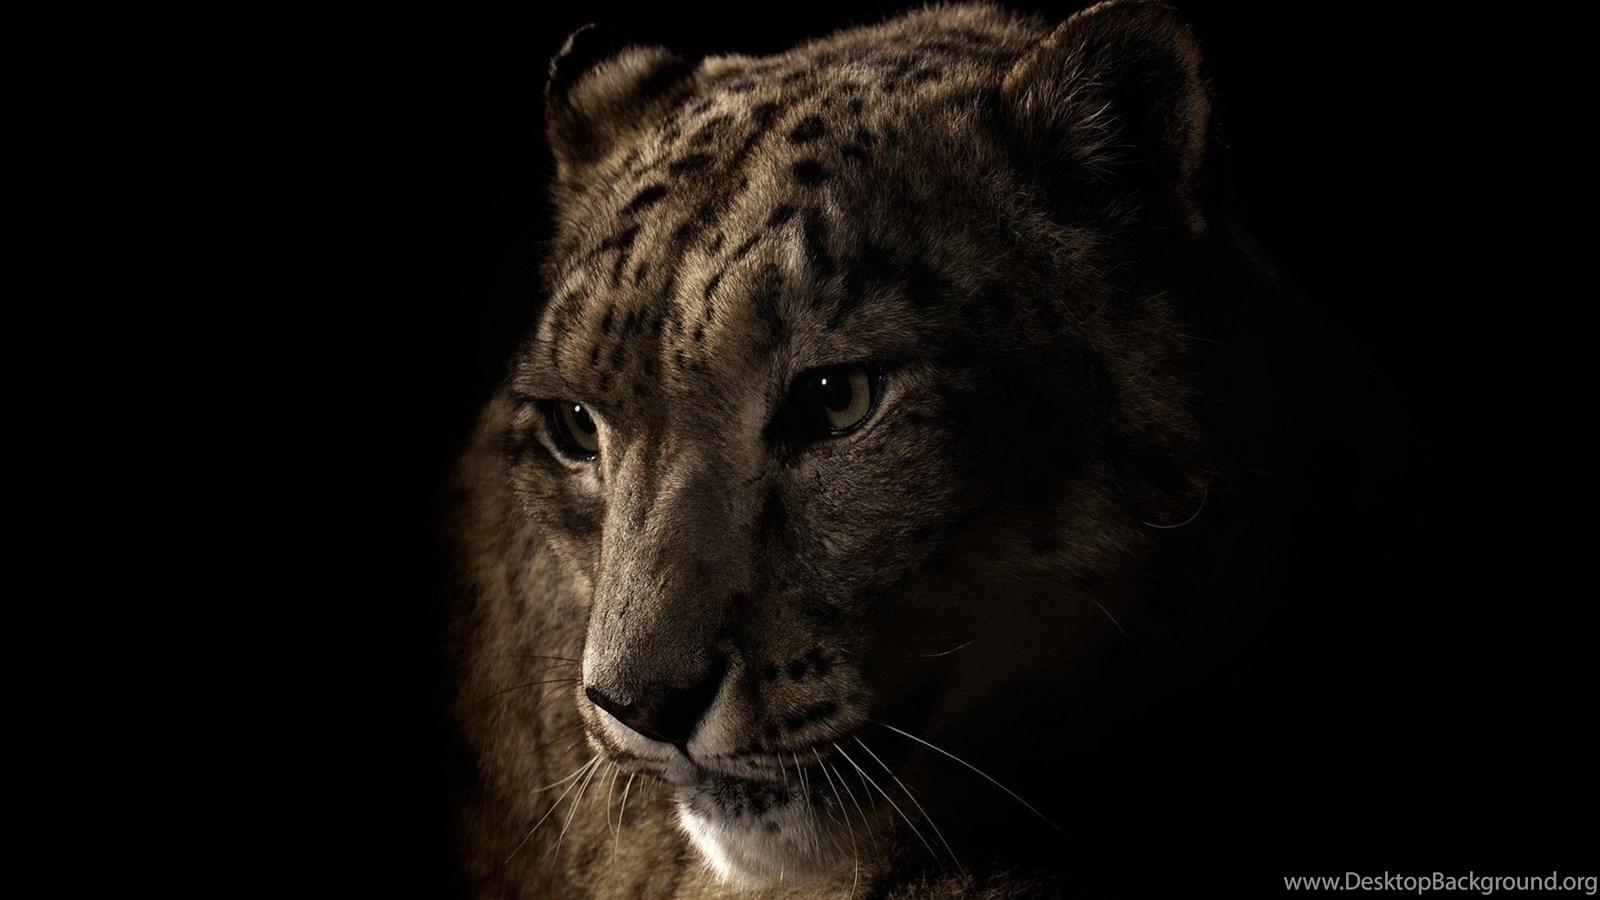 Black Jaguar Animal Black Jaguar Wallpapers Animal Johnywheels Desktop Background